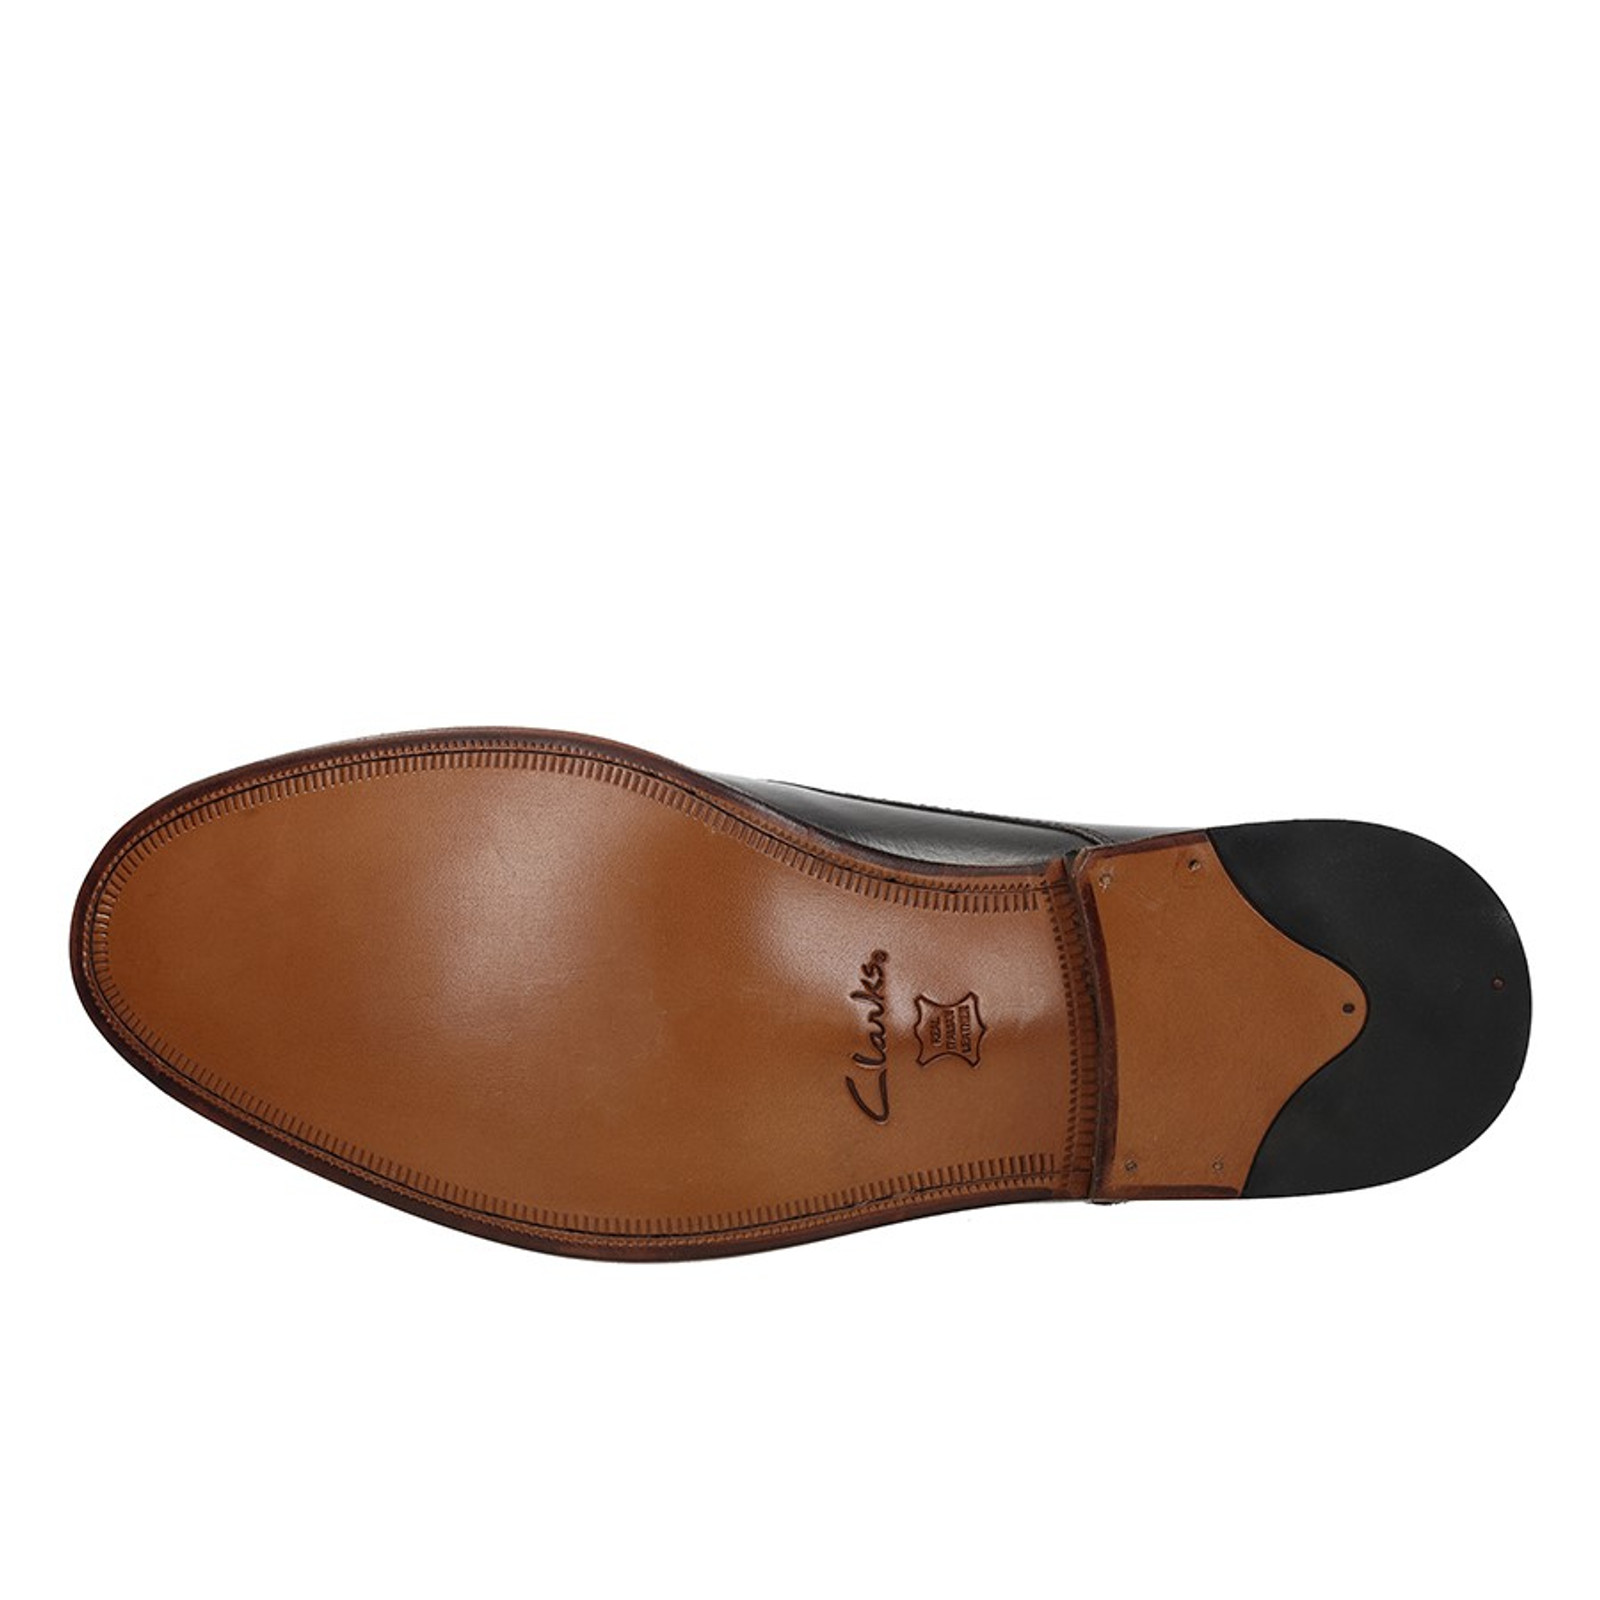 Clarks Mens JAMES CAP Dark Brown Leather